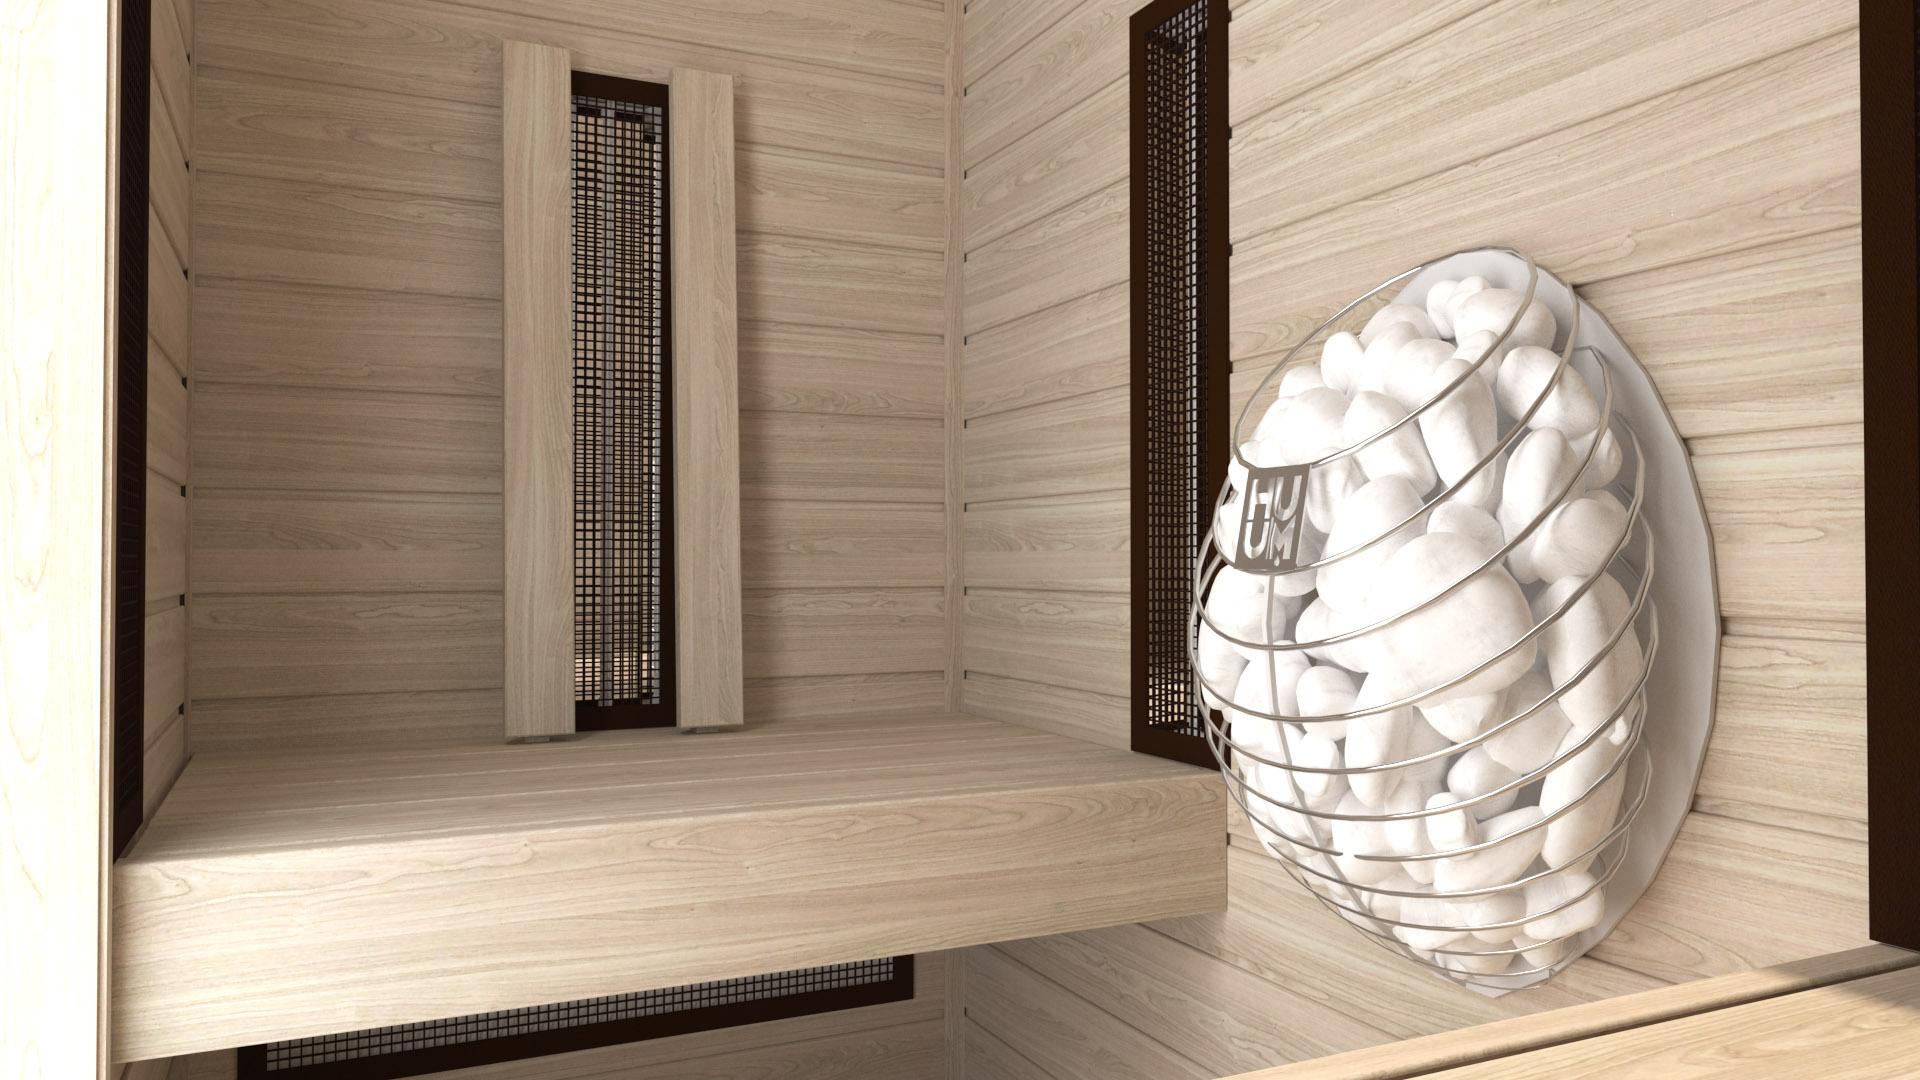 INUA Heimdall udendoers kombi sauna_infraroed sauna3